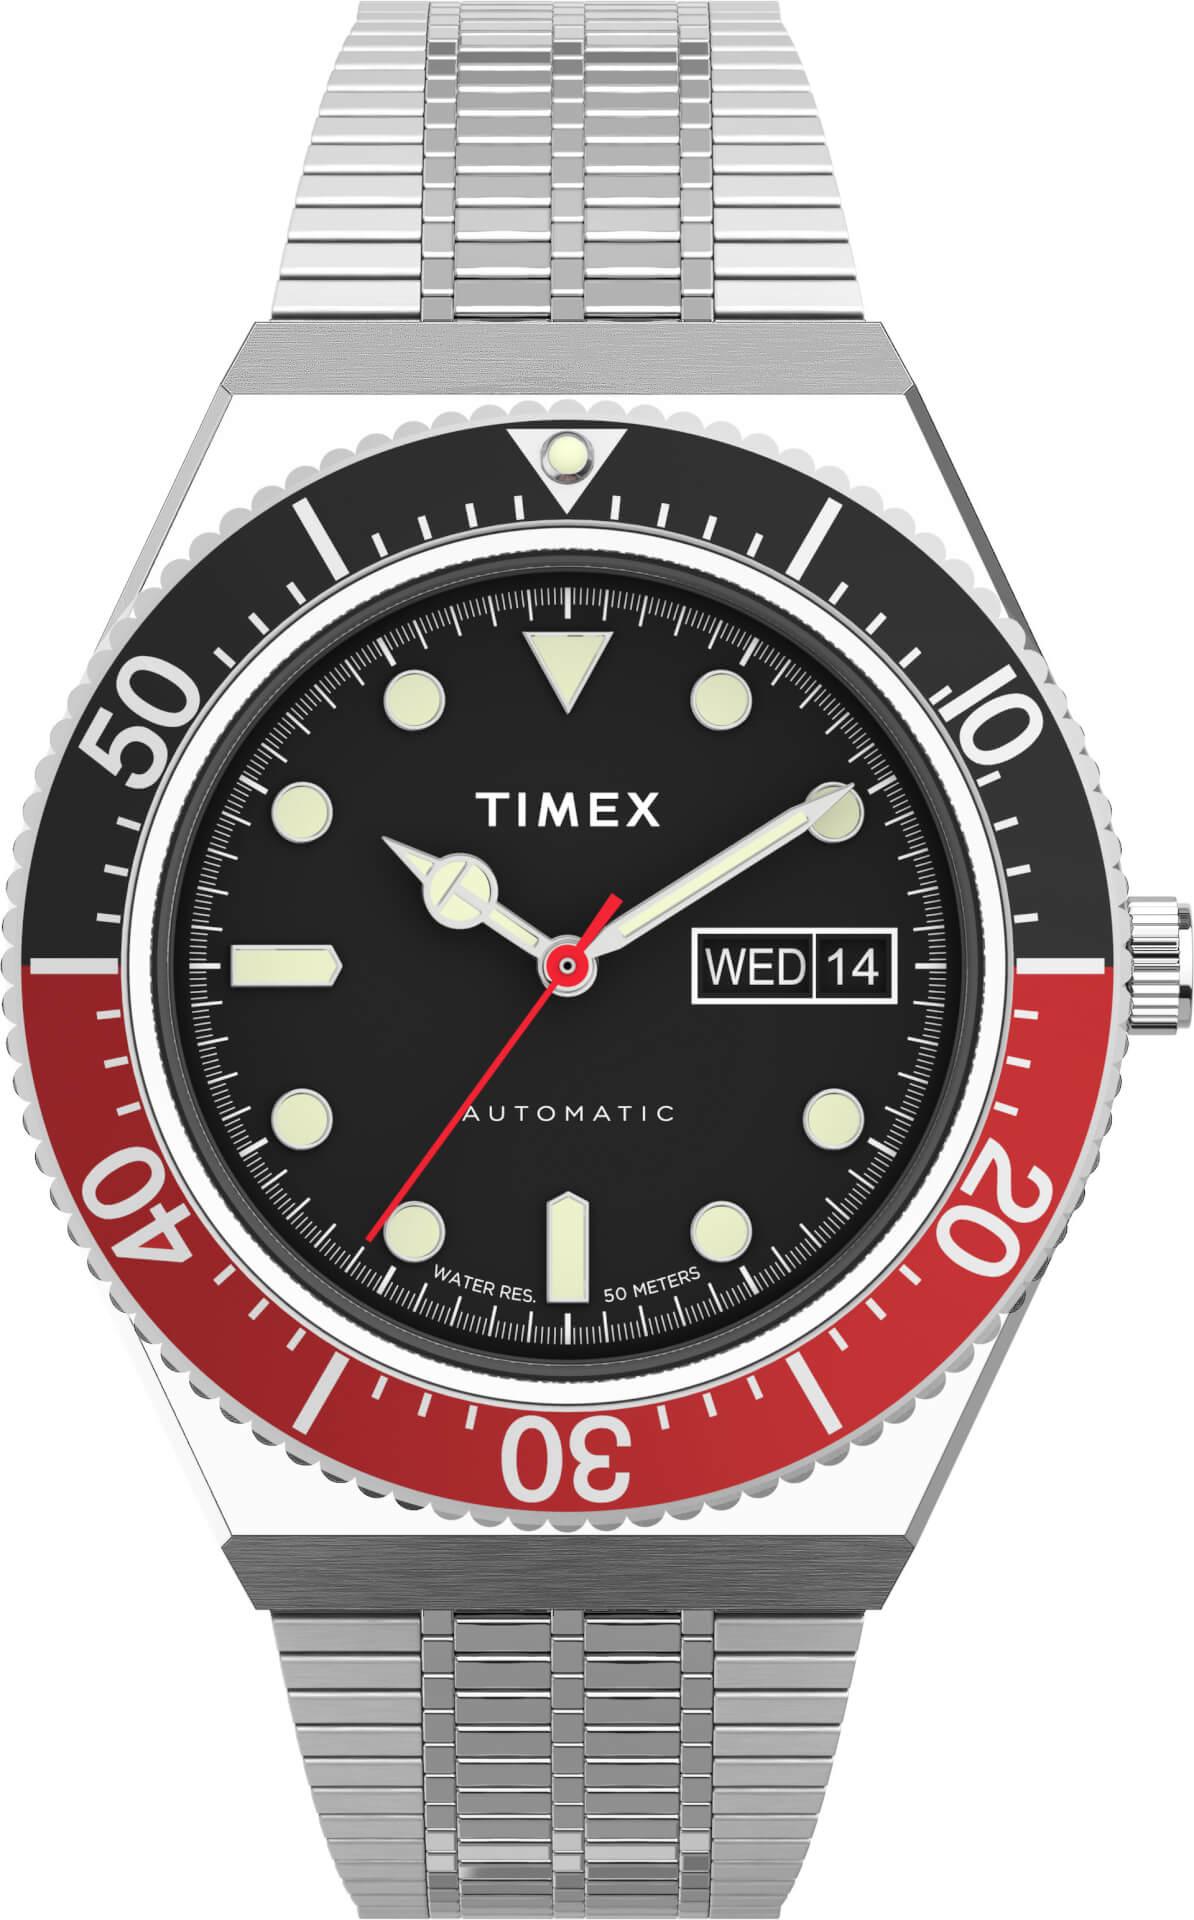 TIMEXの「Q TIMEX」シリーズ『M79』に新色ブラック×レッドカラーが登場!本日予約受付開始 tech210528_qtimex_2